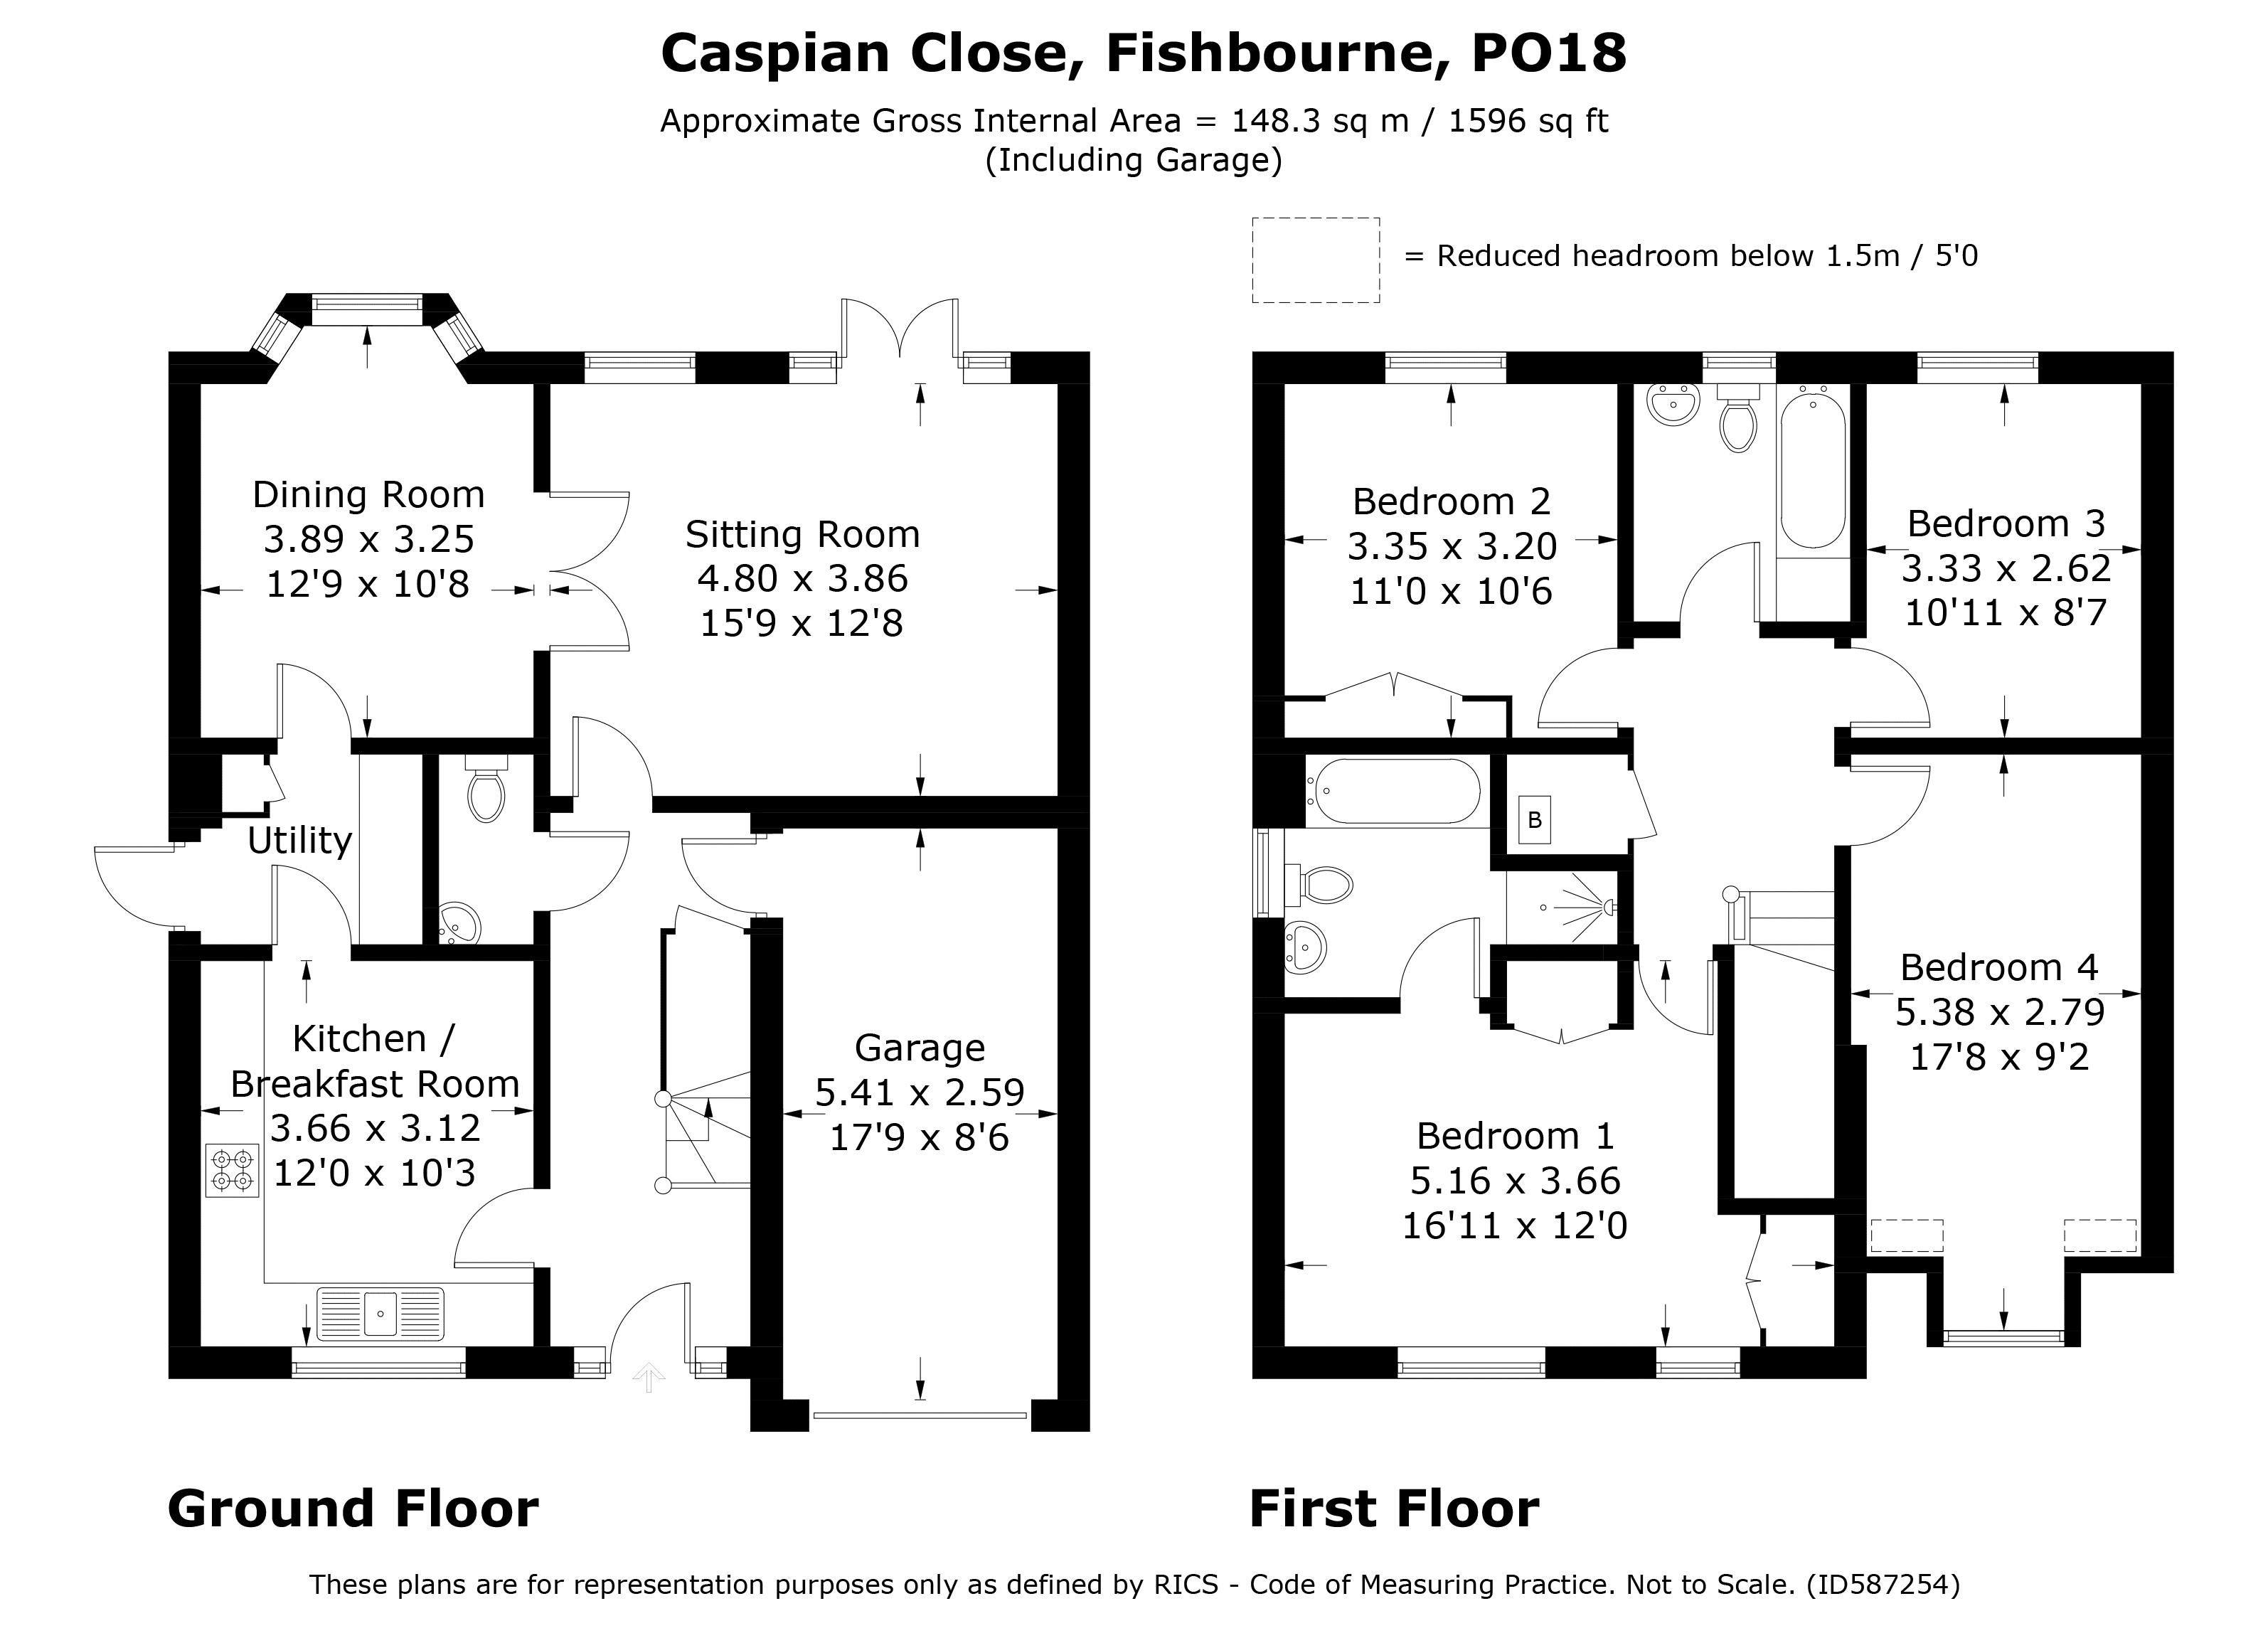 Caspian Close Fishbourne